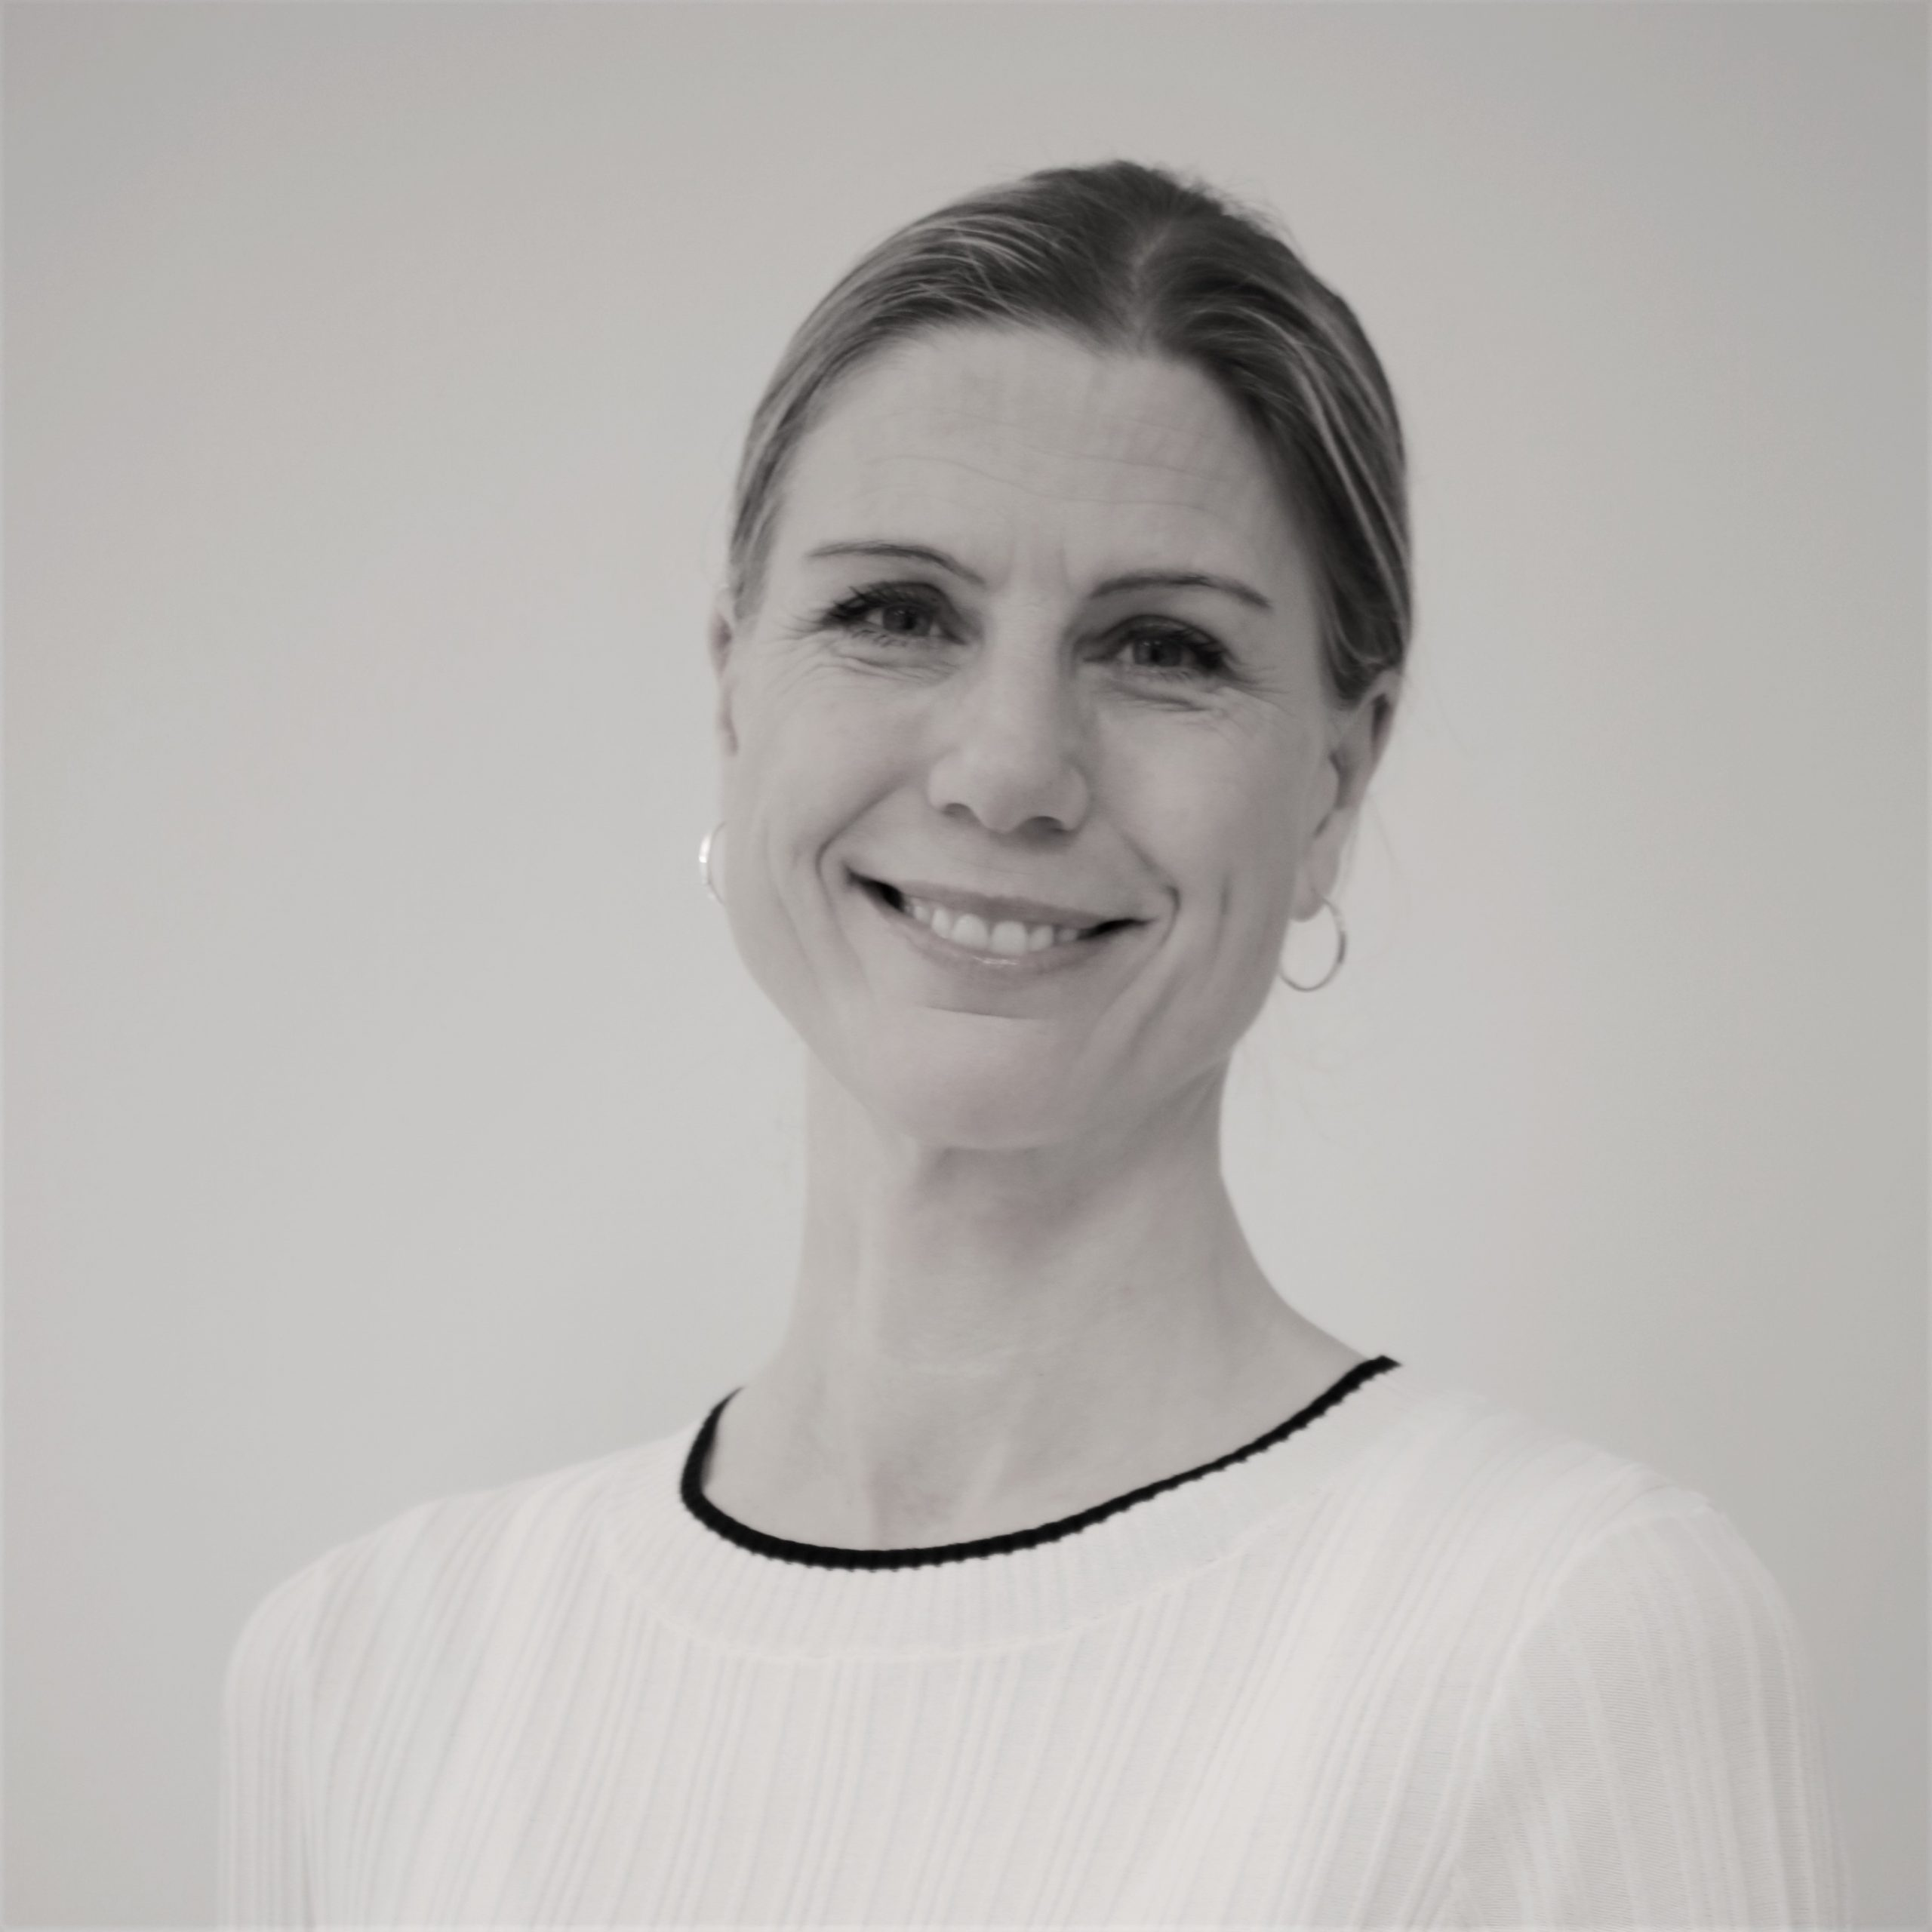 Jenny Wingqvist Bergh